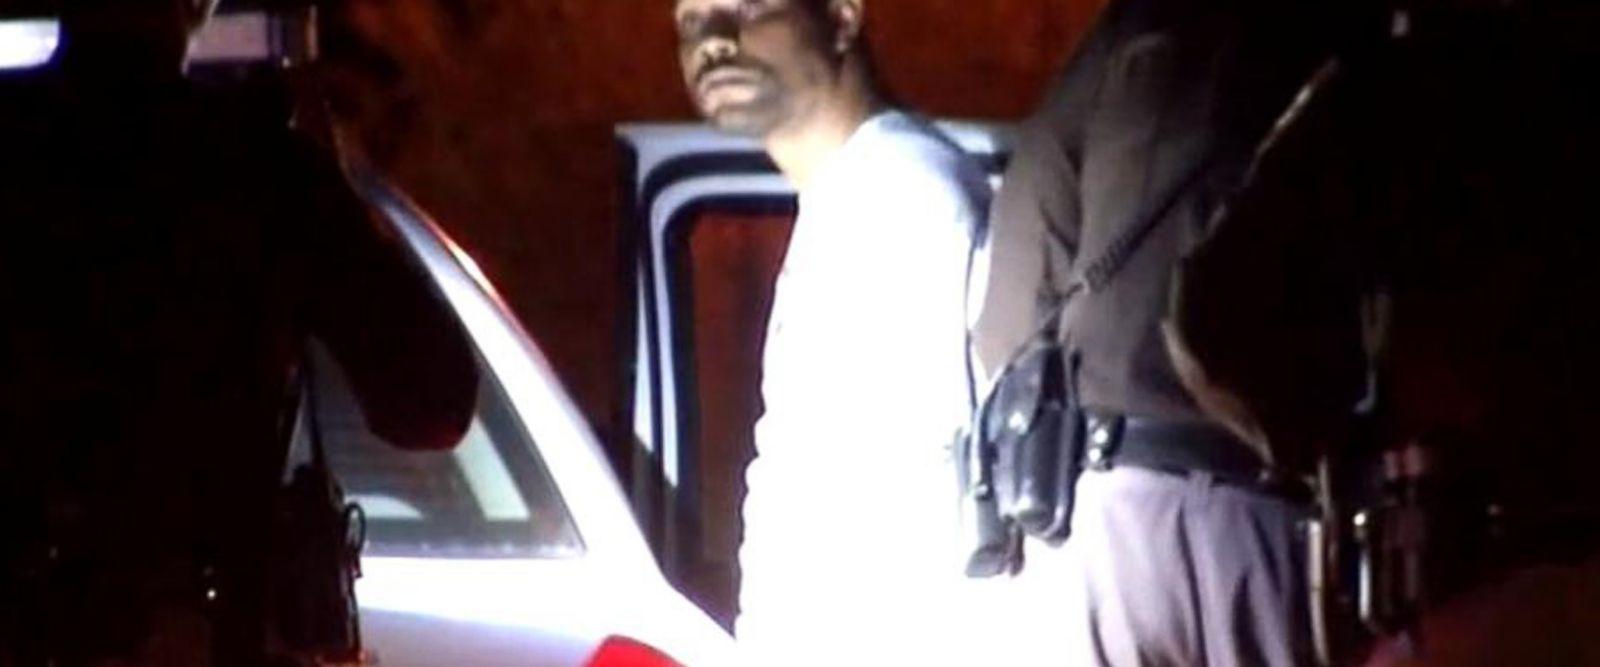 VIDEO: Police take Maryland workplace shooter into custody